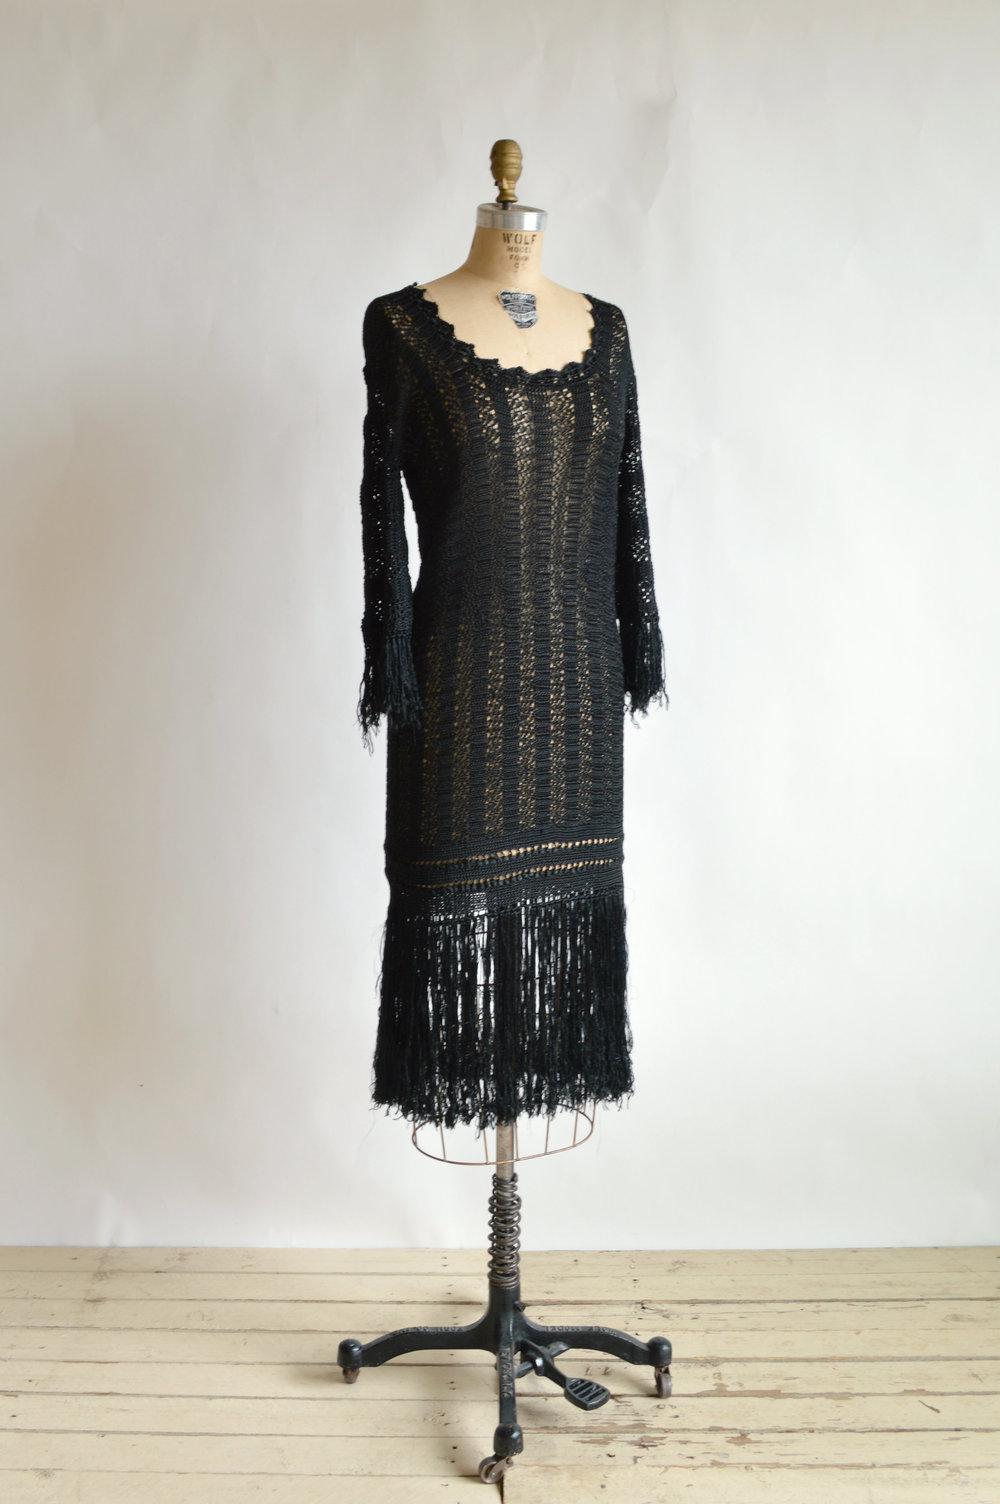 1920s Crochet Dress